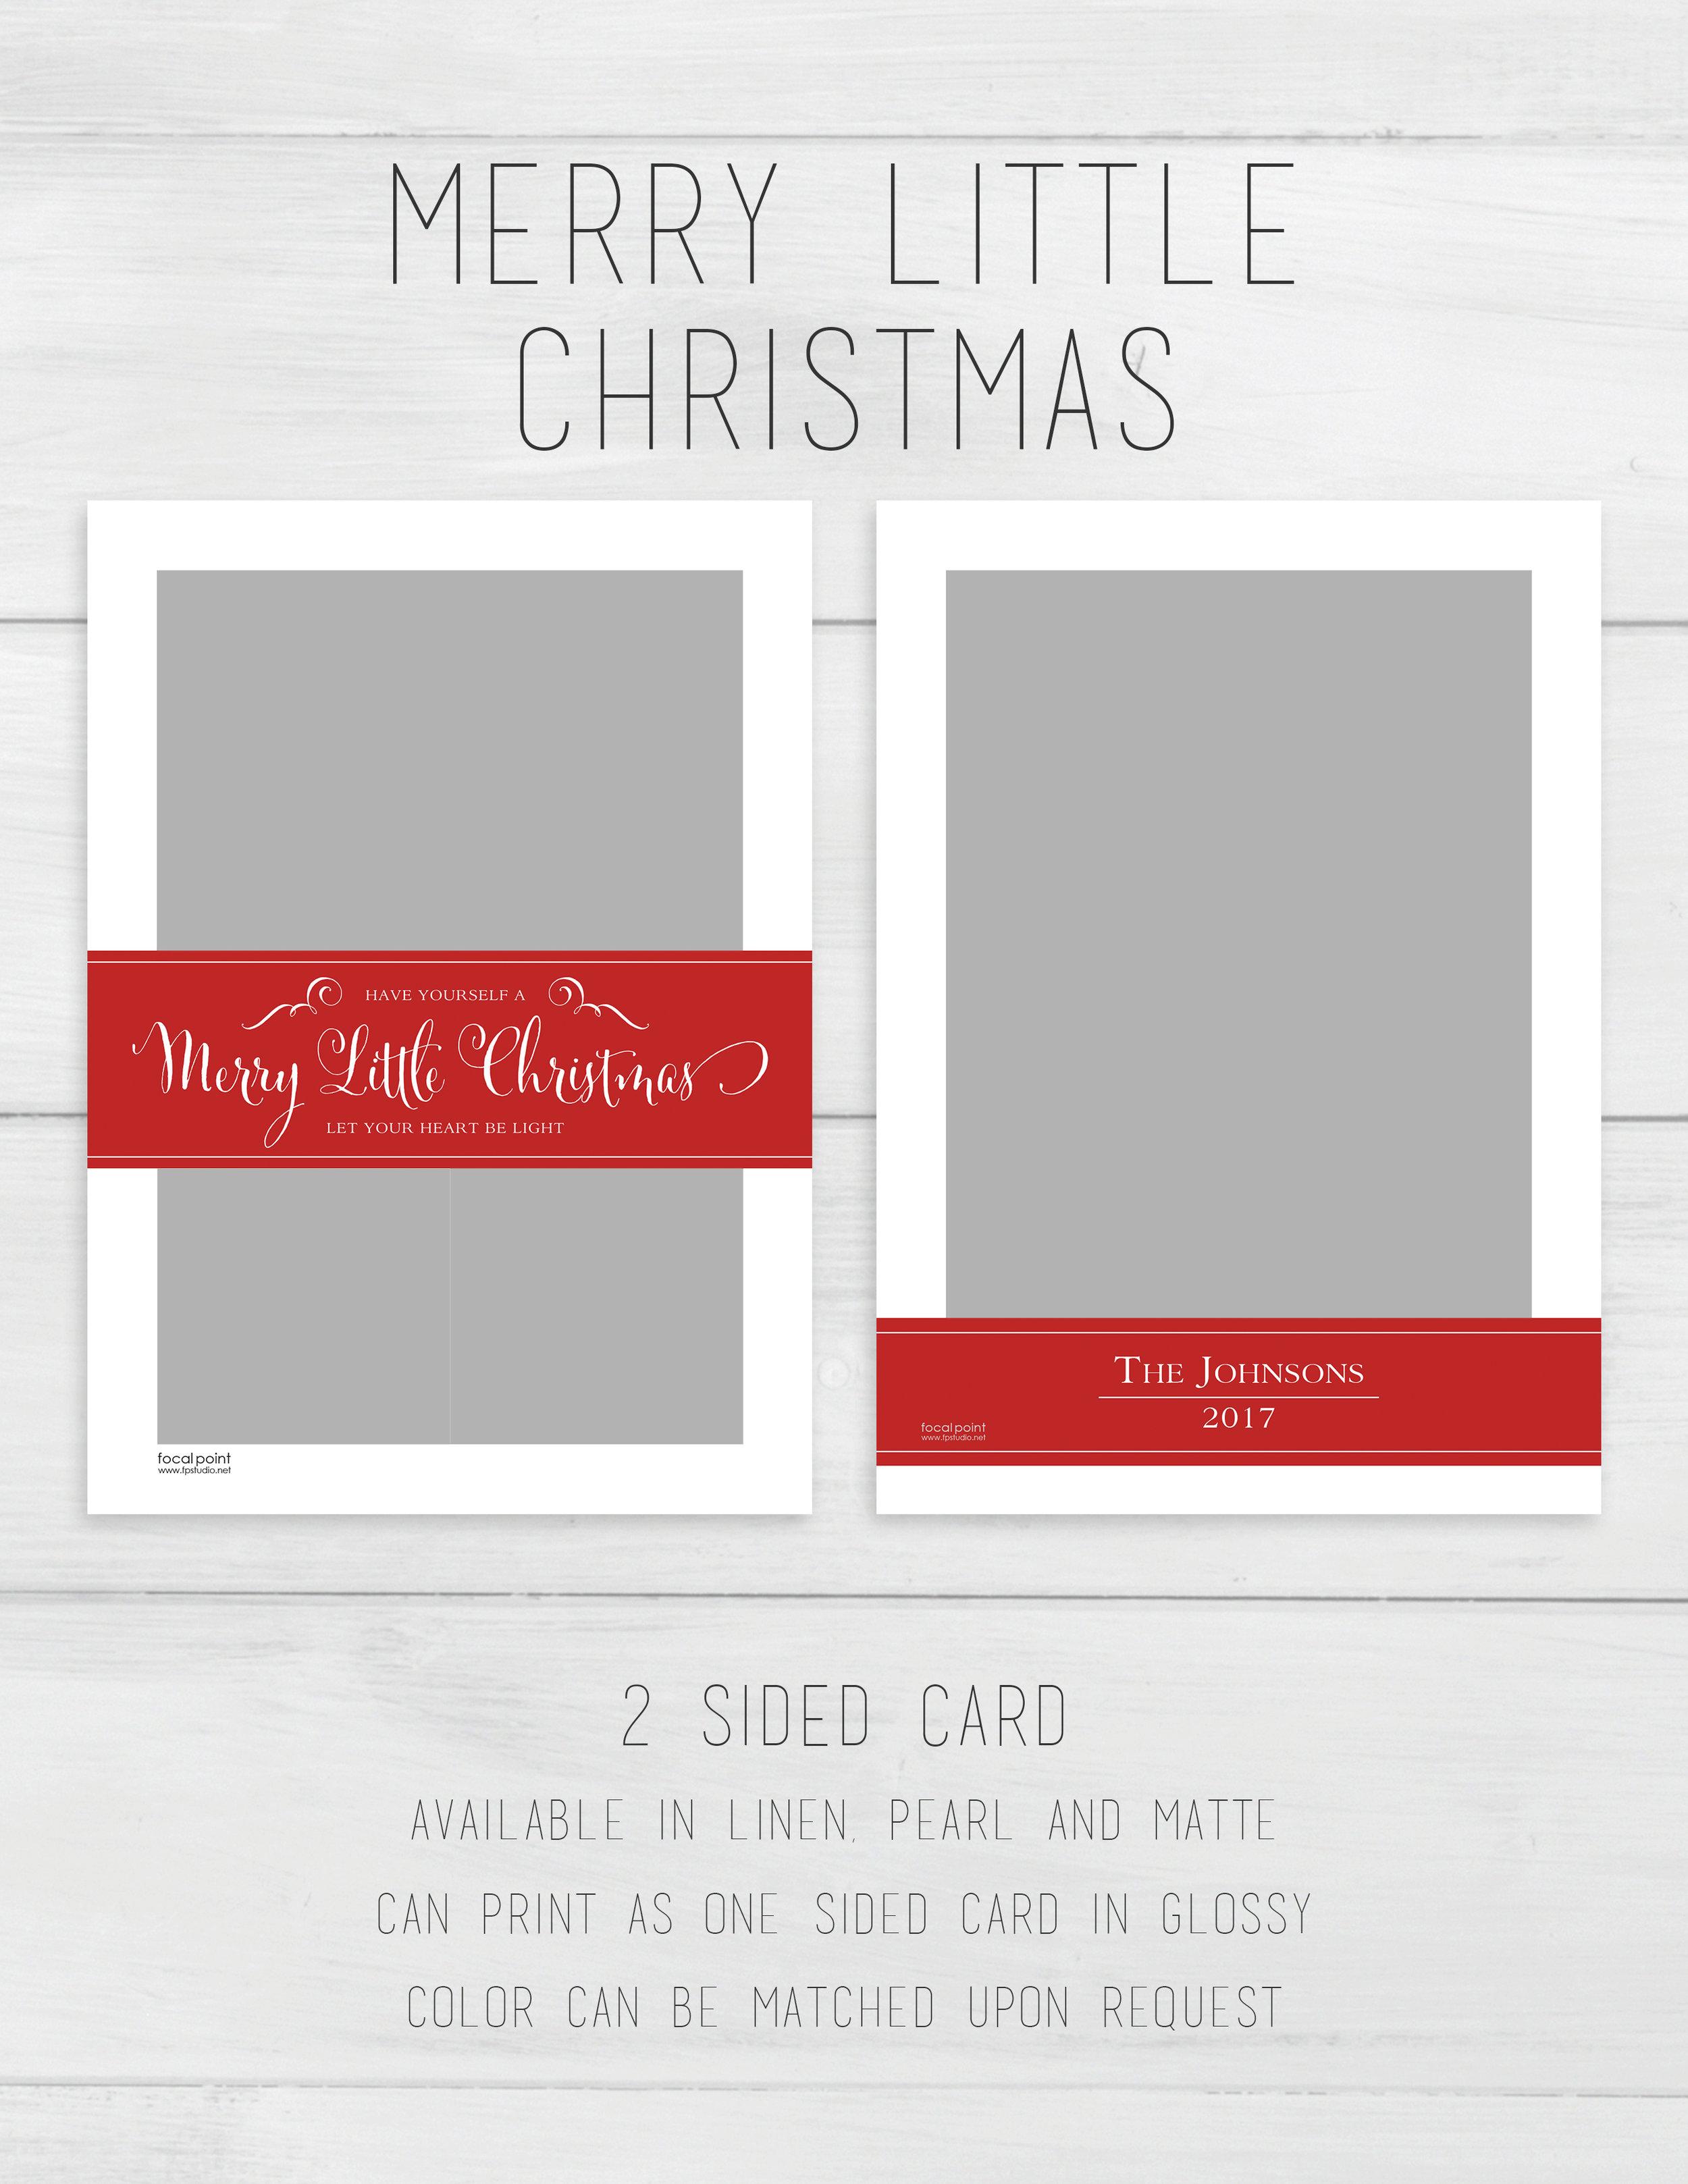 DISPLAY_2SIDE_Merry_Little_Christmas.jpg